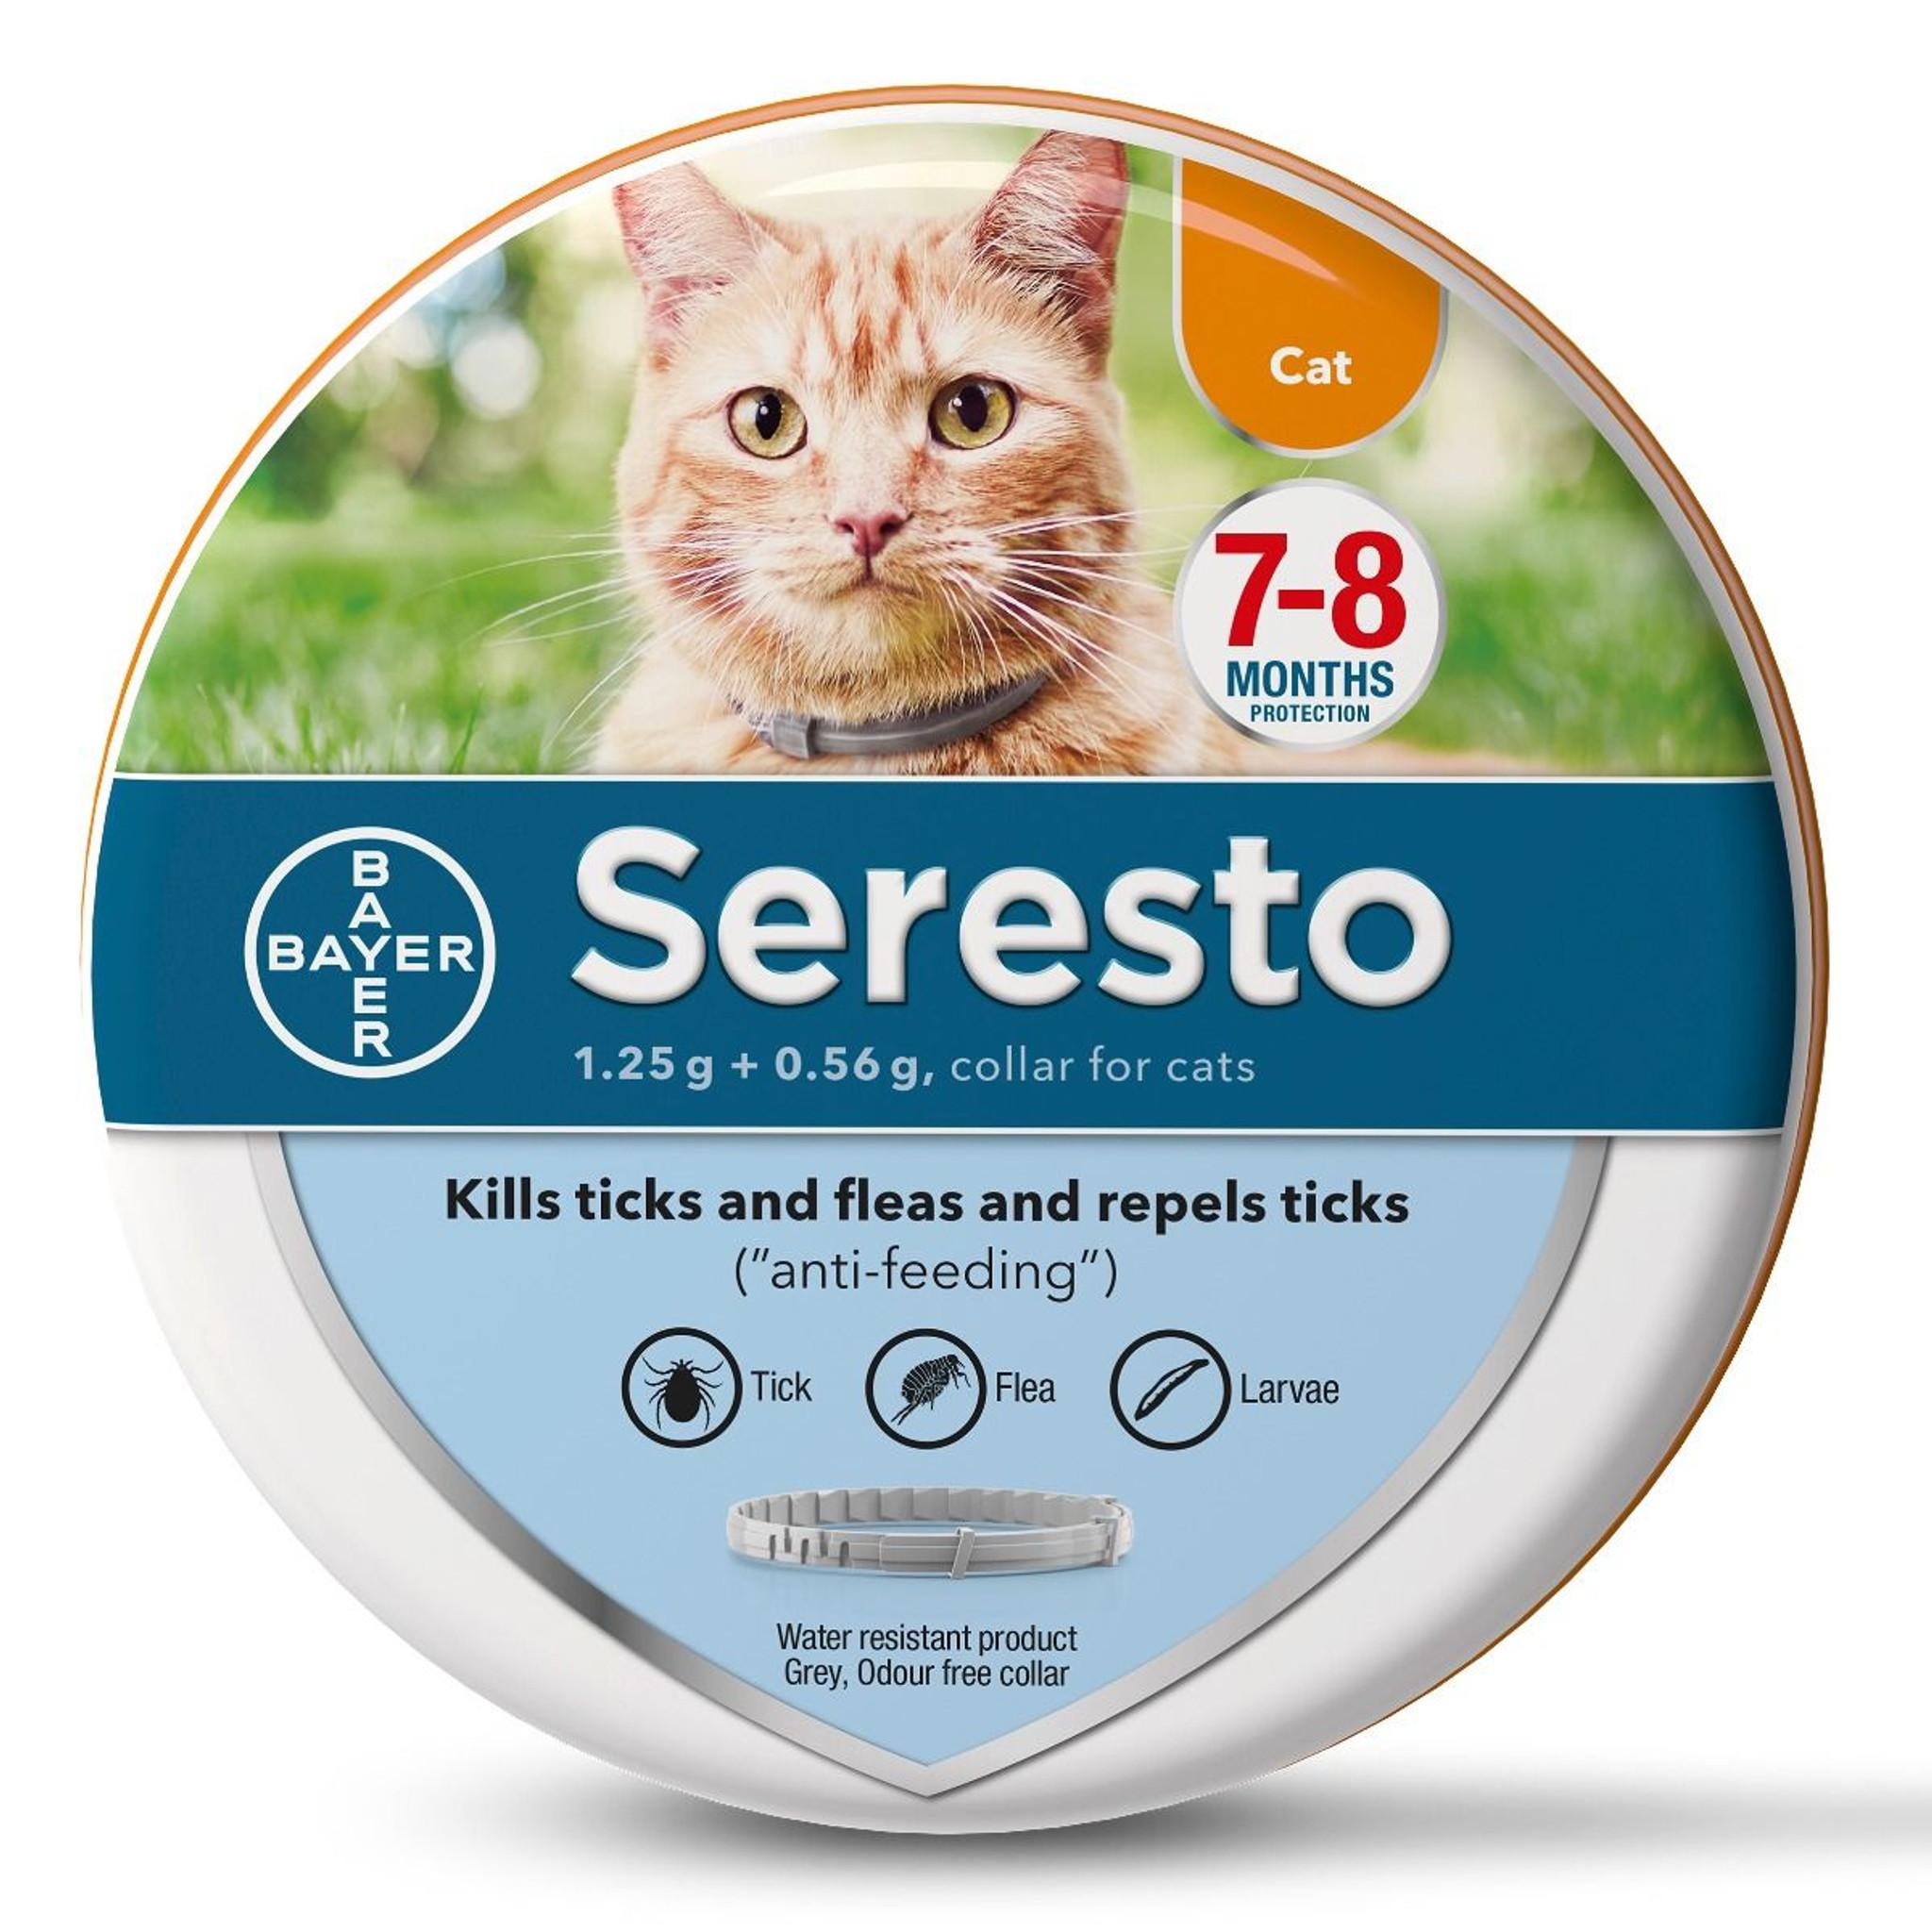 Seresto Flea & Tick Collar for Cats